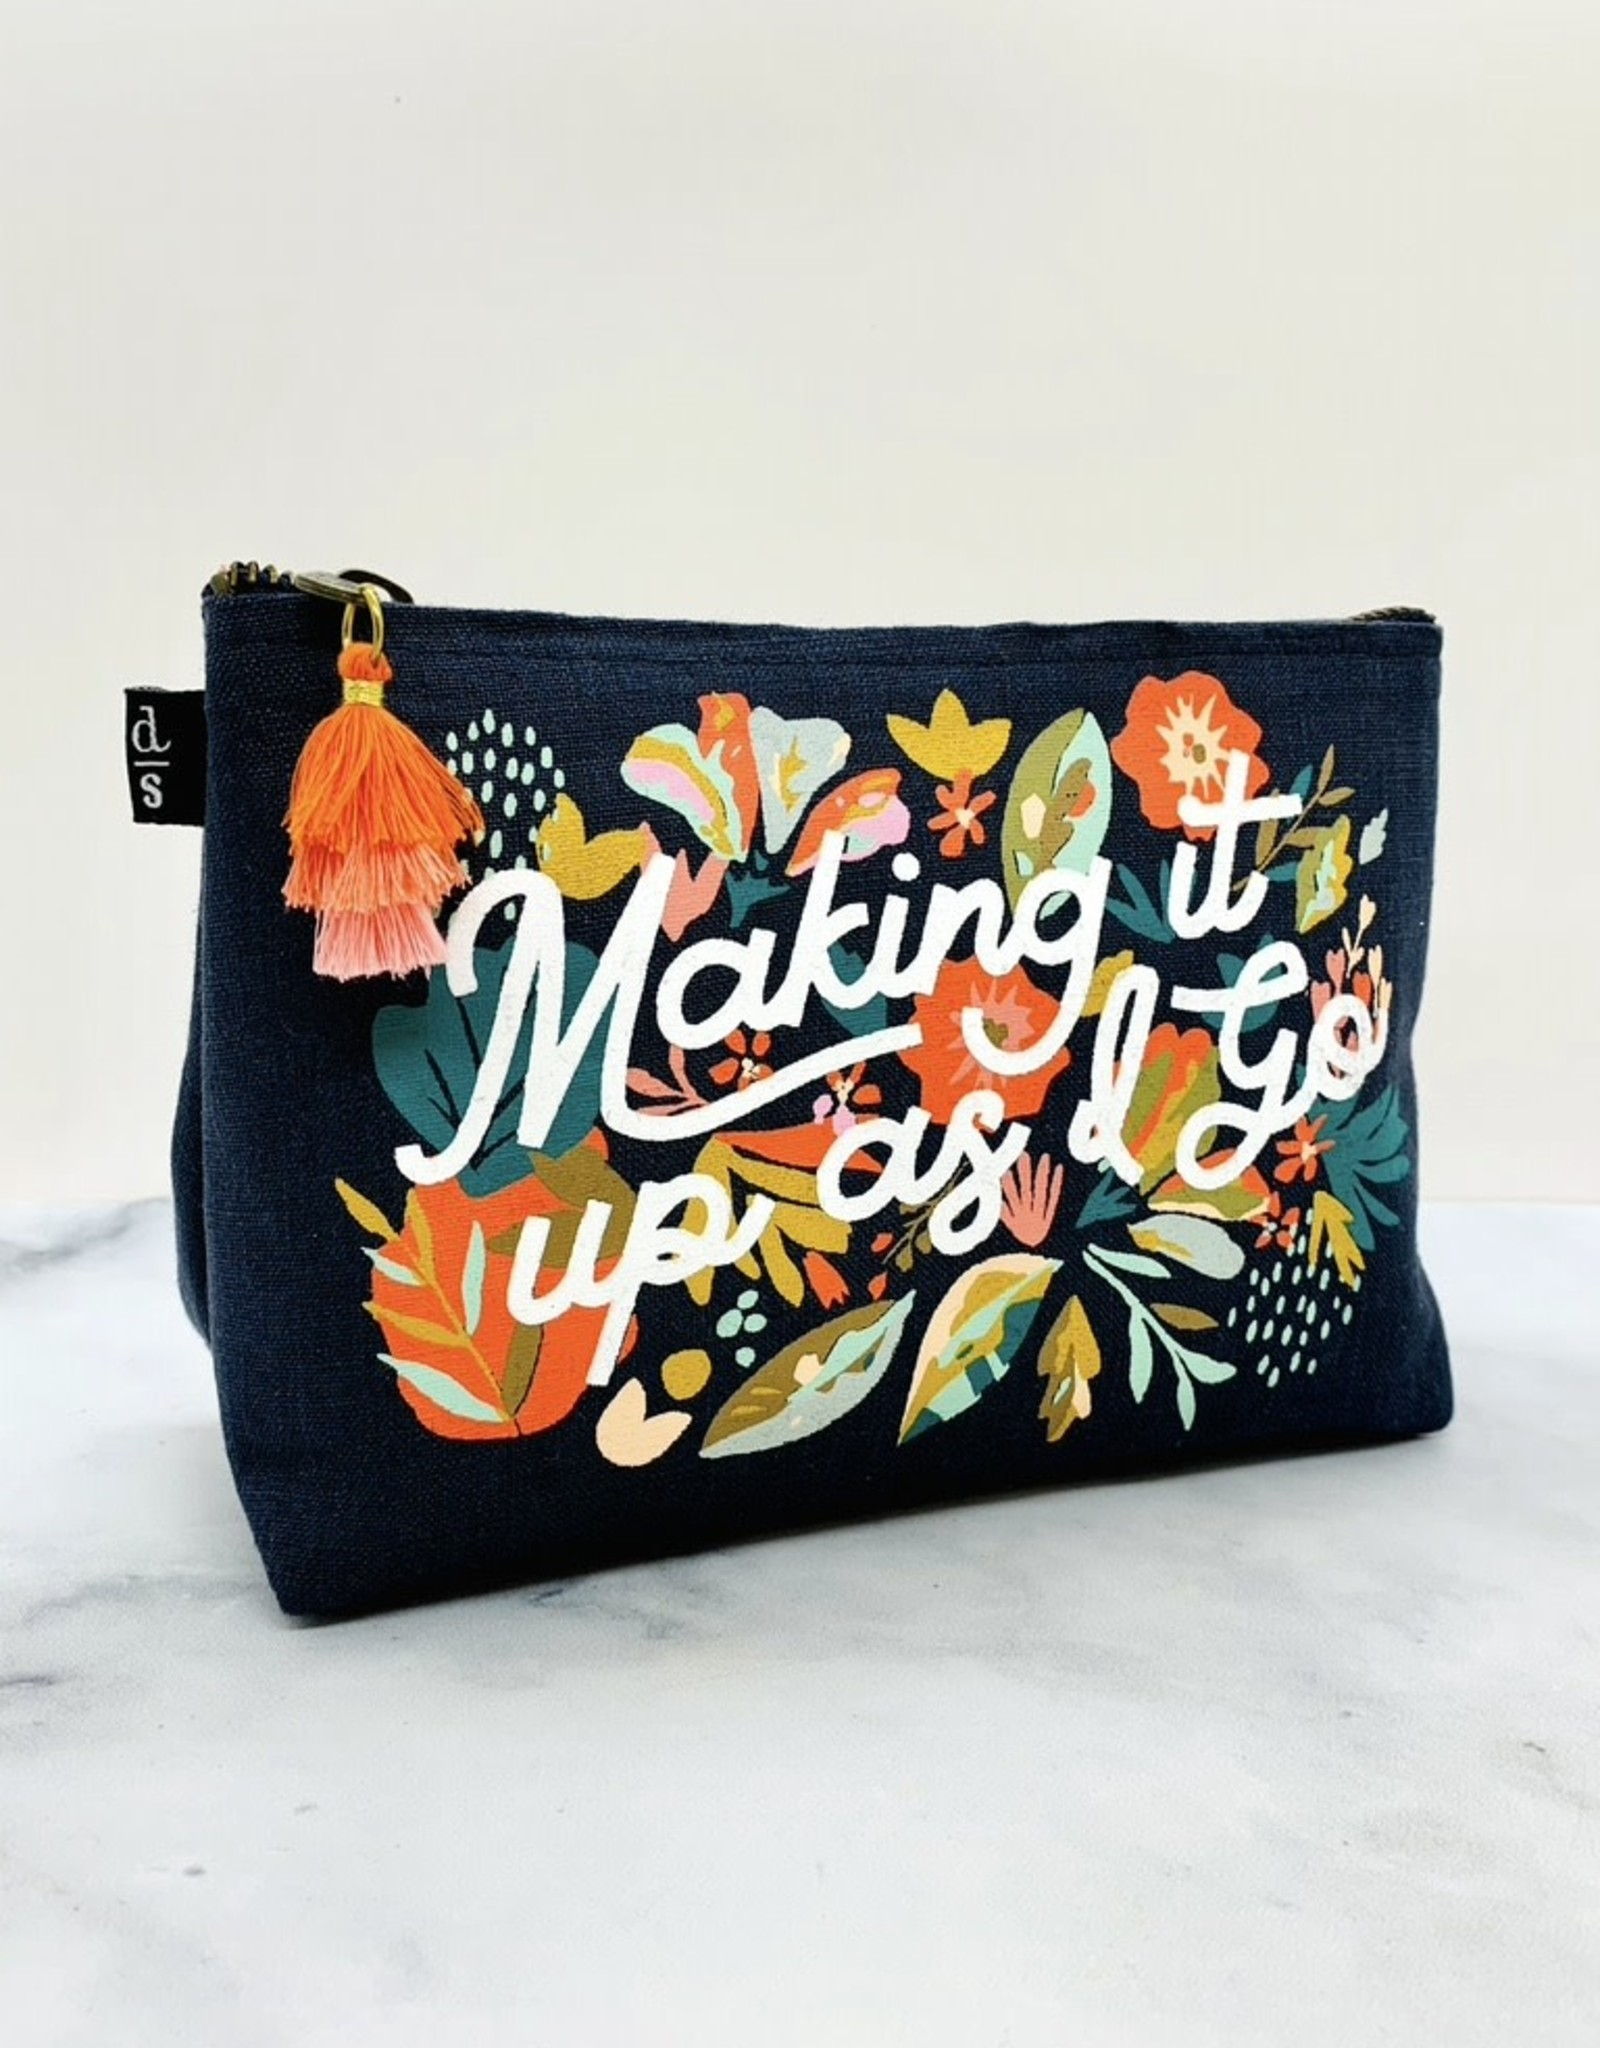 NOW Superbloom Small Cosmetics Bag